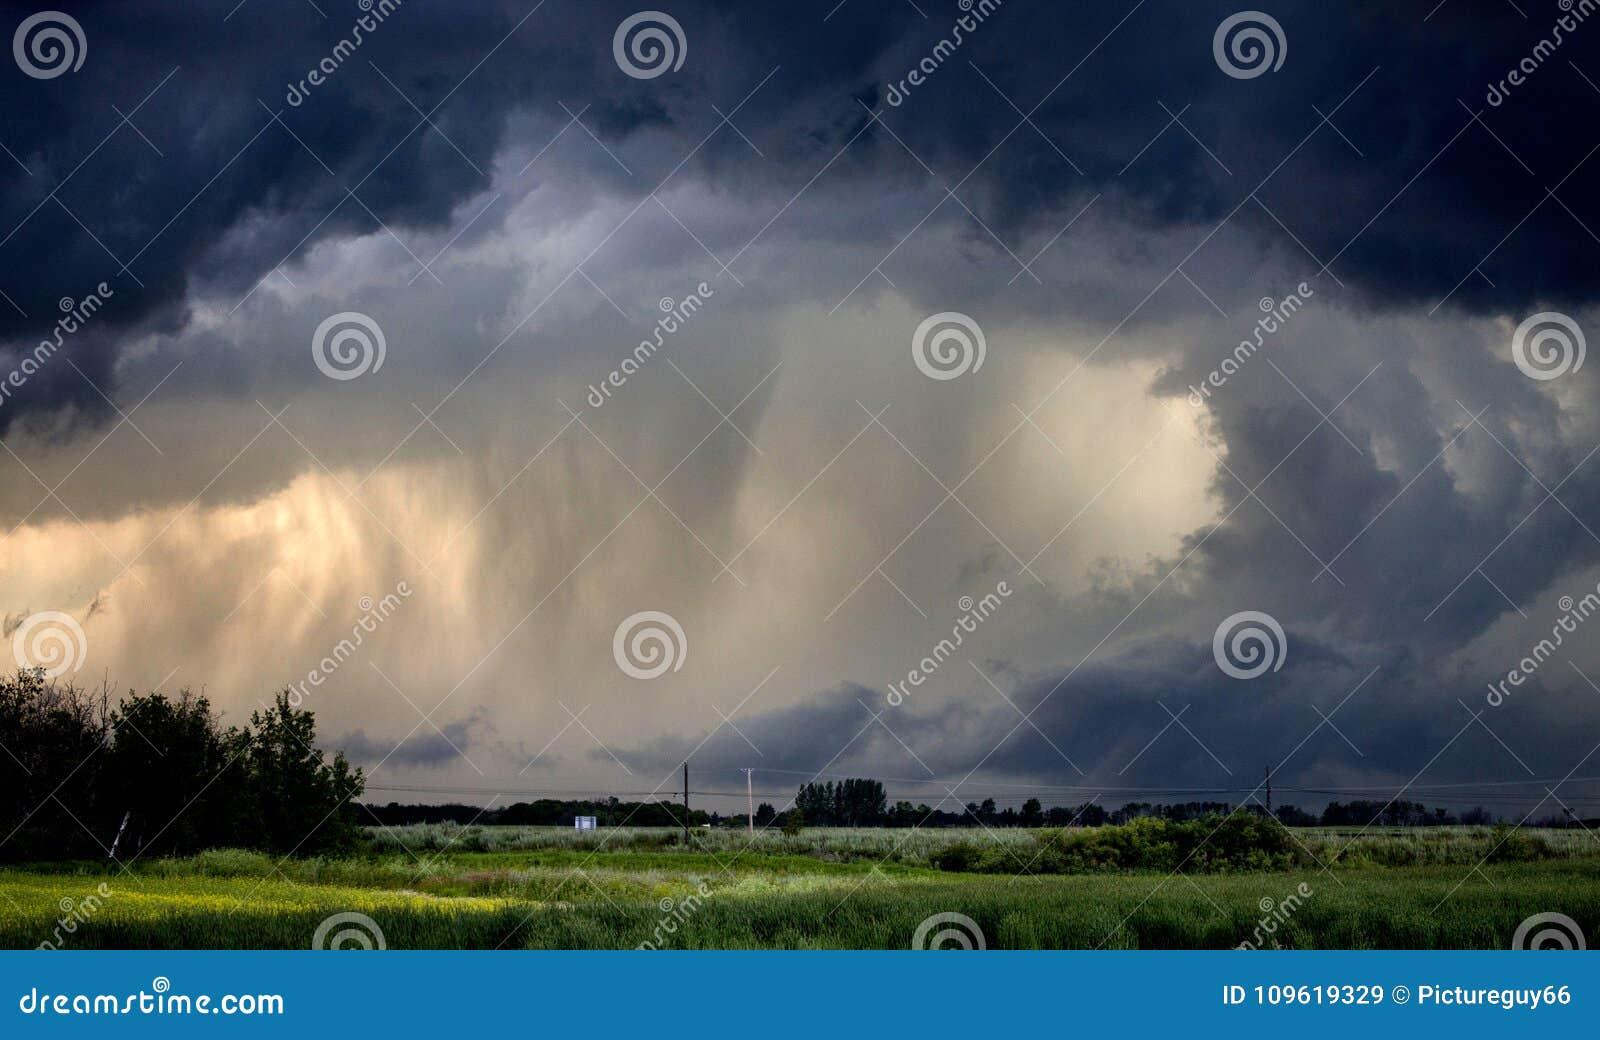 Tornado Gewaarschuwd Onweer